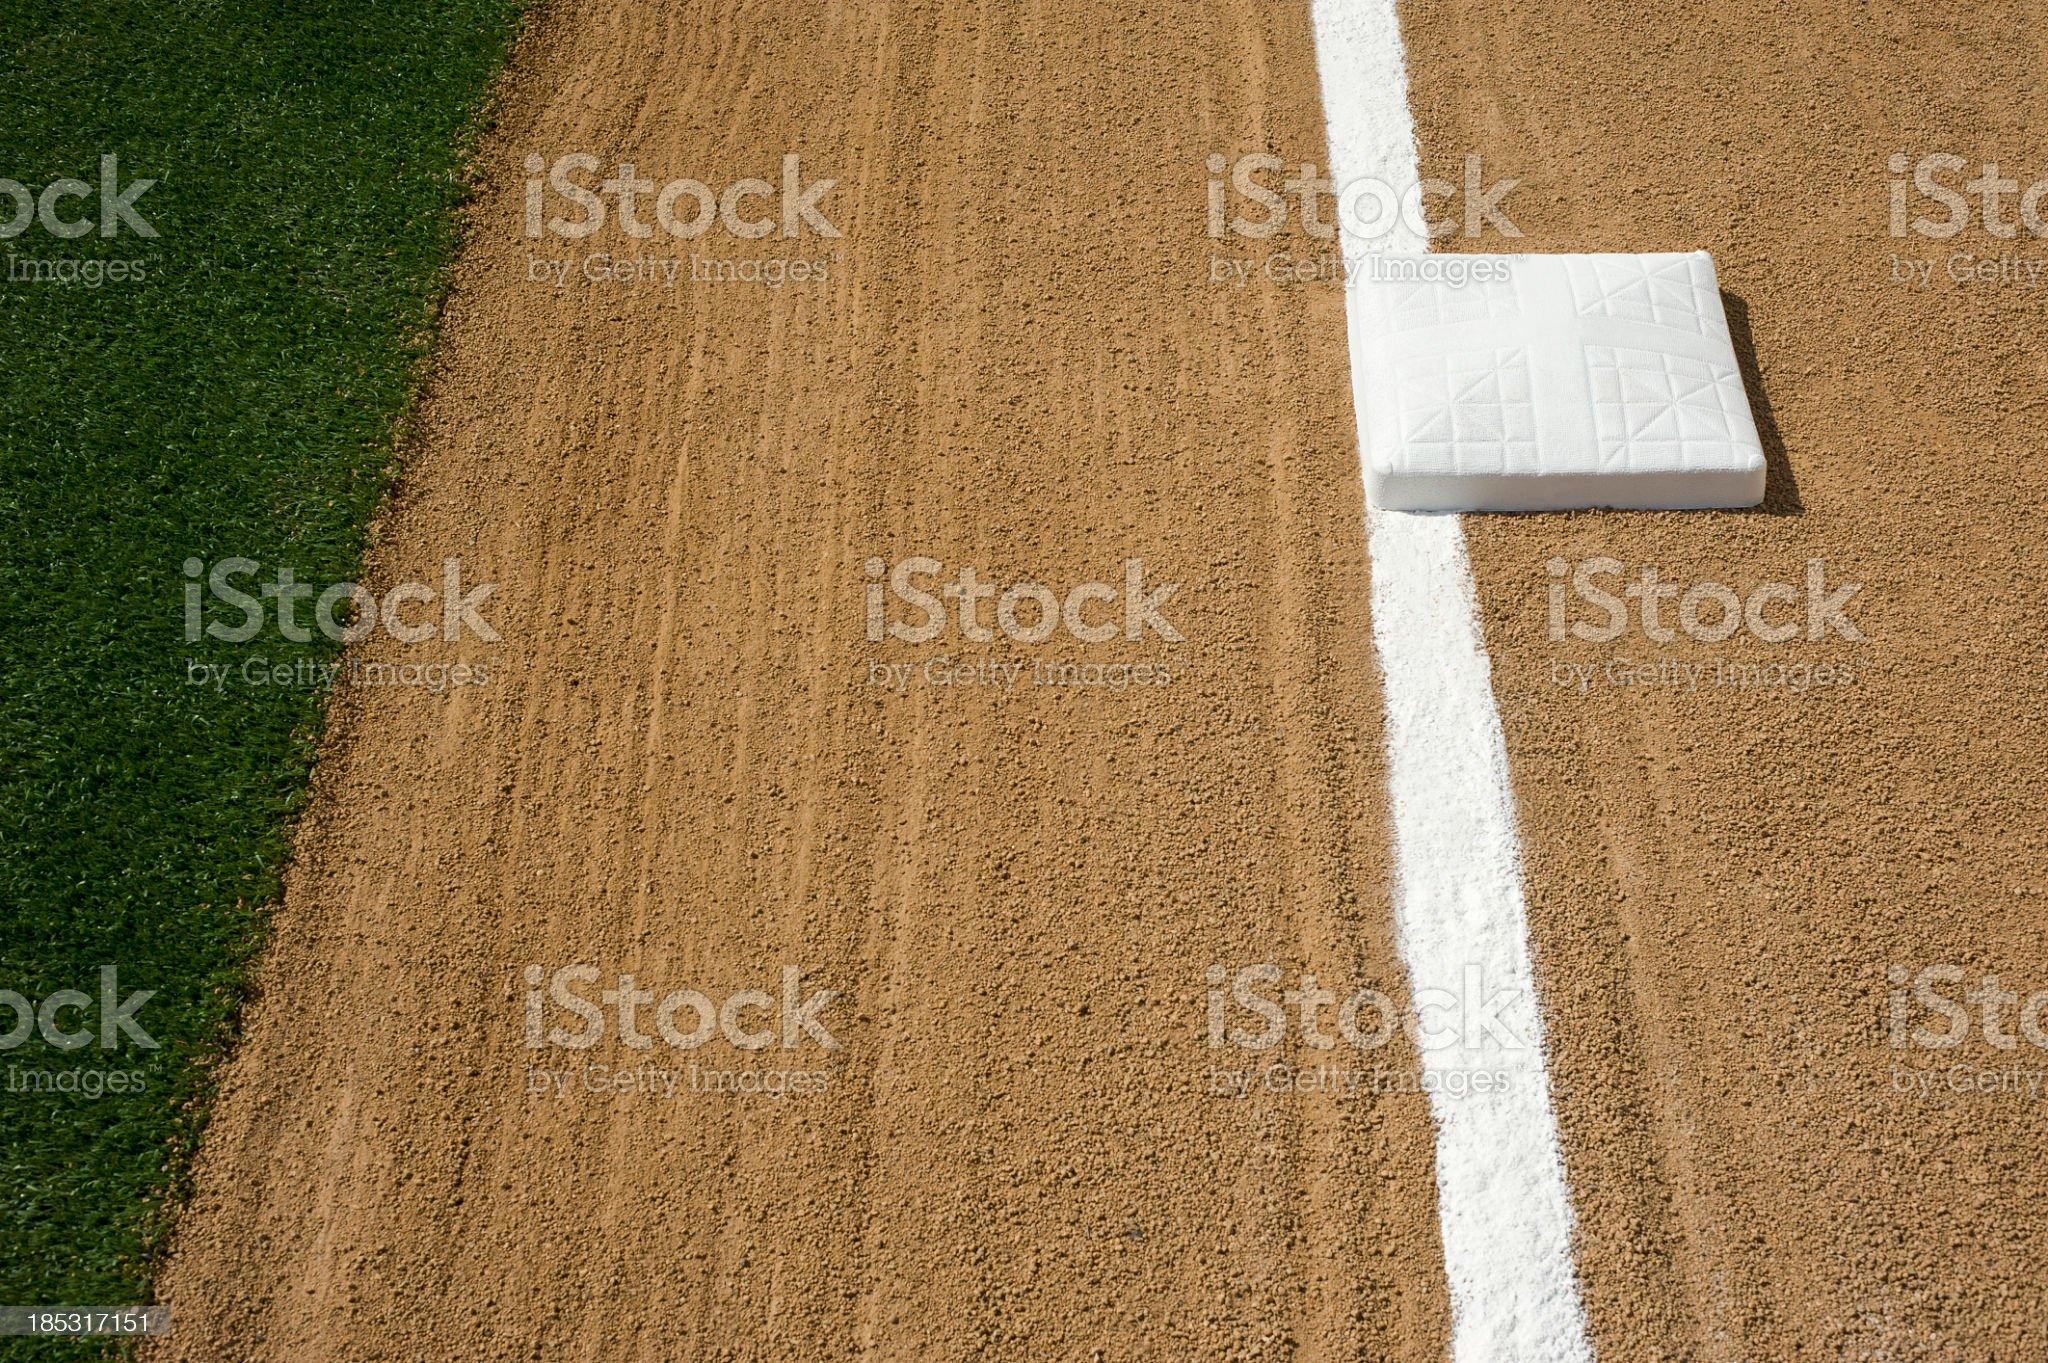 Baseball/Softball Infield, Third Base and Foul Line royalty-free stock photo